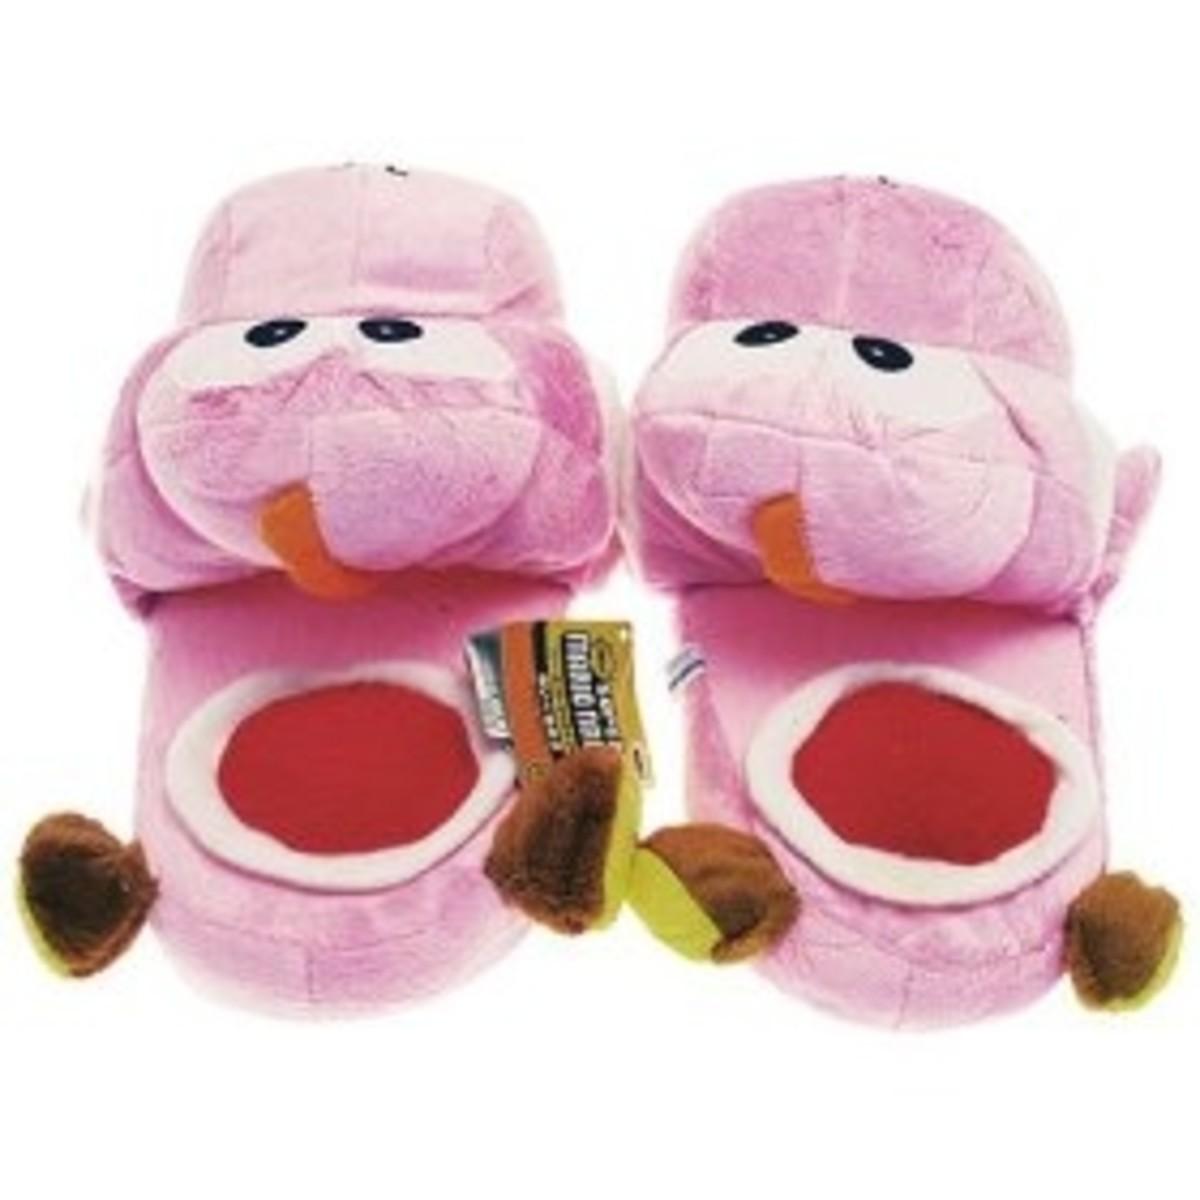 Super Mario Brothers Yoshi Pink Ver. Slippers Plush